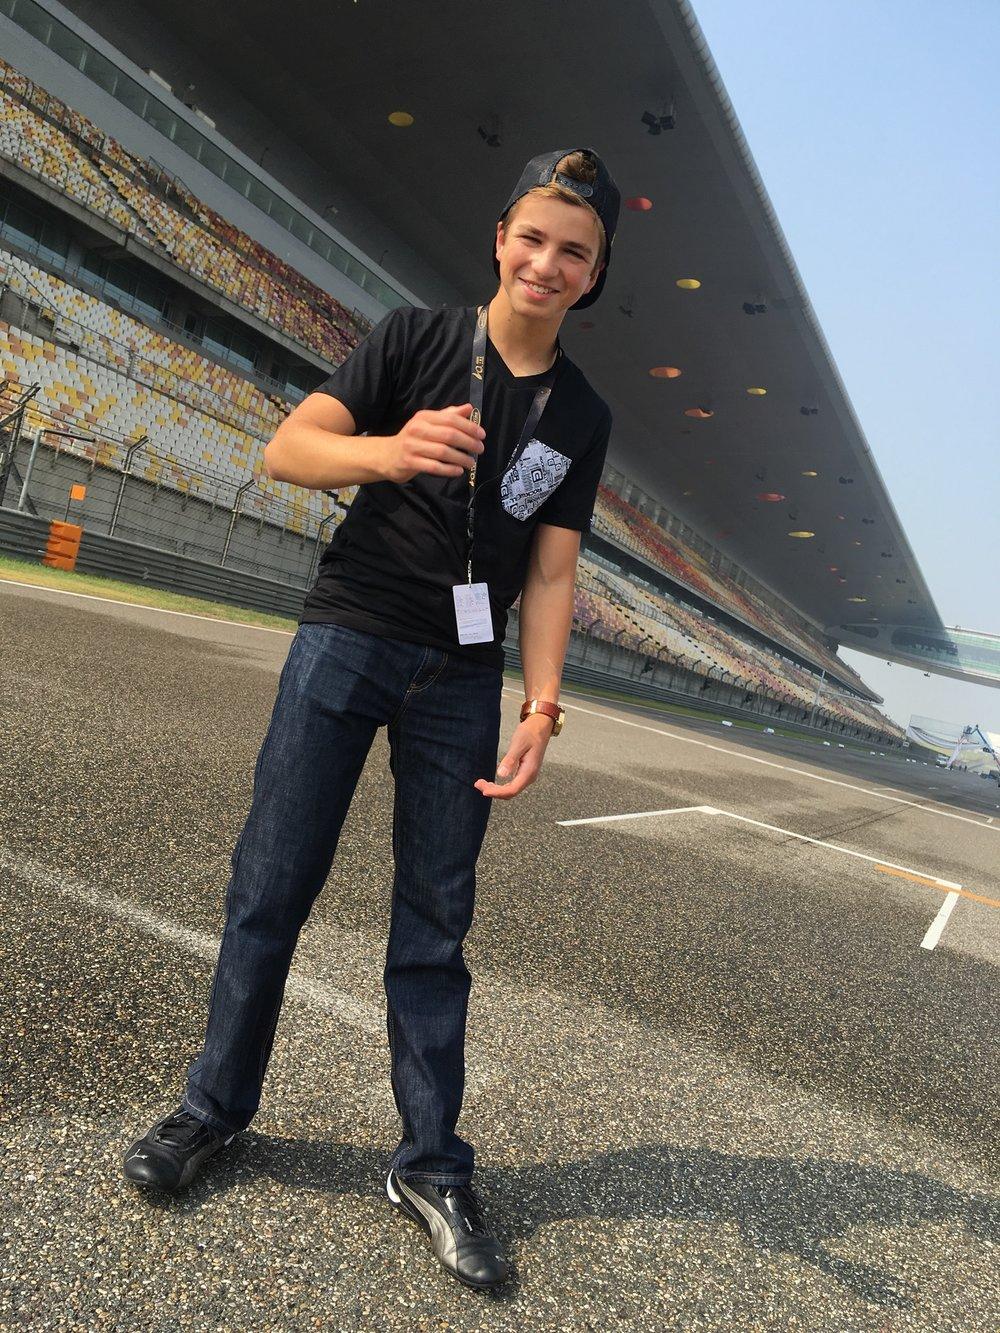 Bruno Carneiro at the Shanghai International Raceway, Shanghai, China (Sep.2016). Photo by Luigi Carneiro